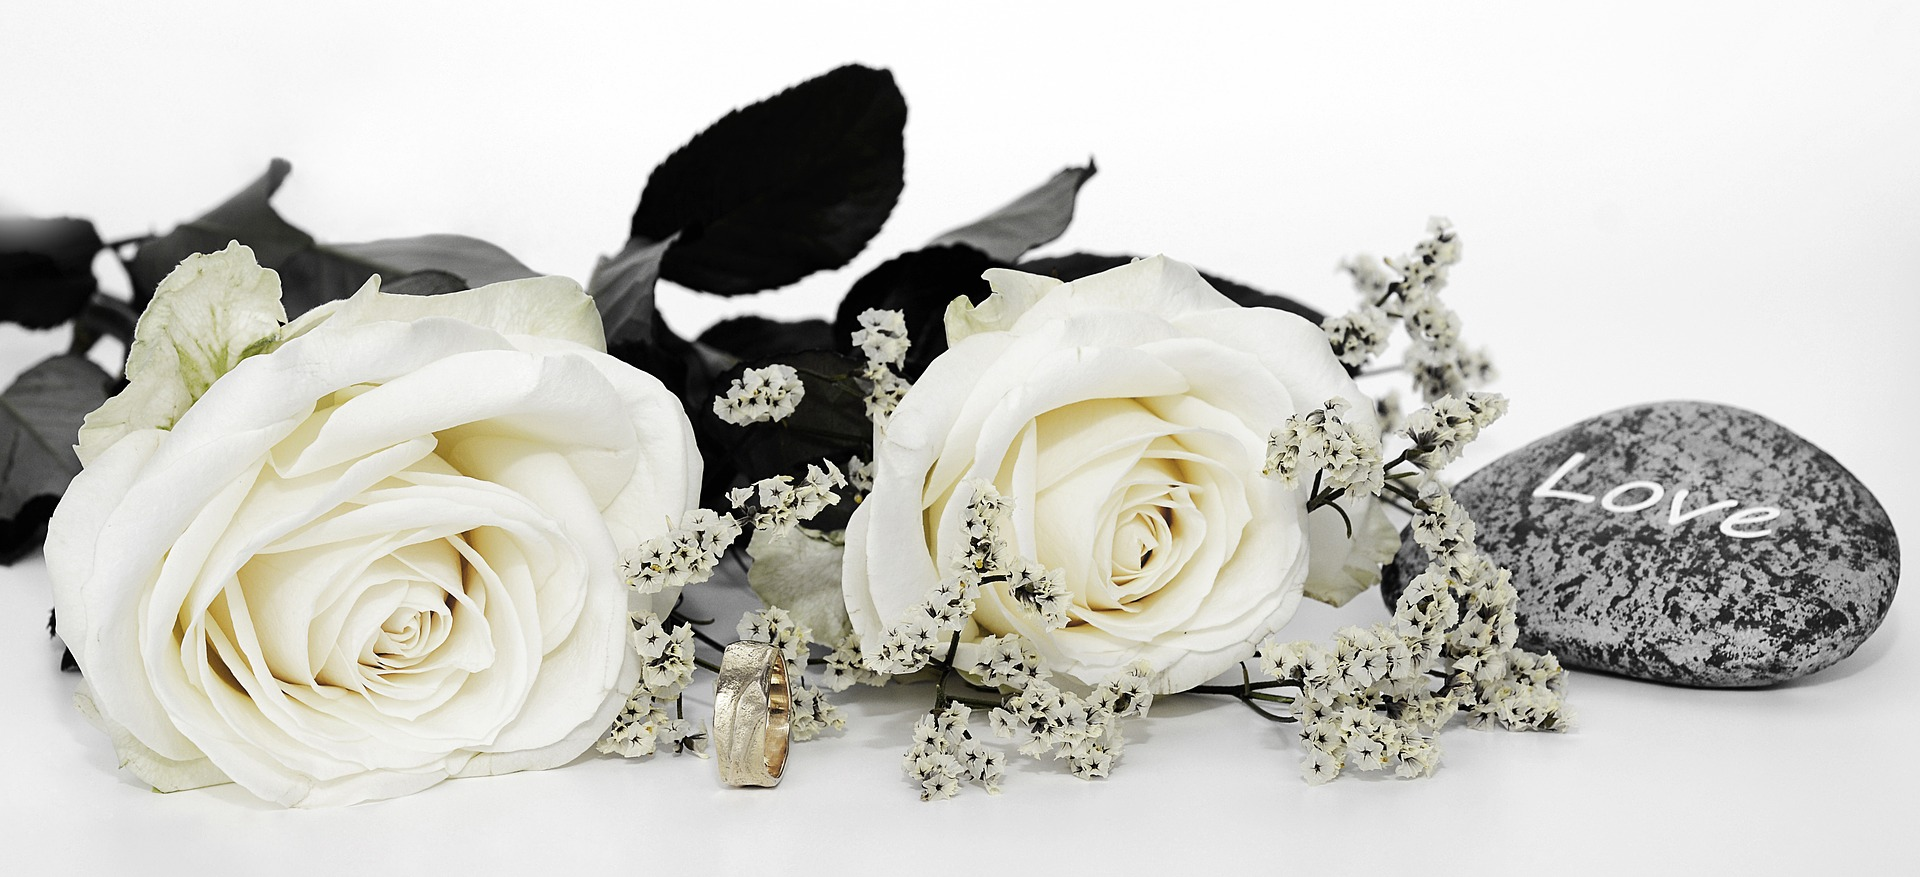 Gift Bryllup Ægteskab Par